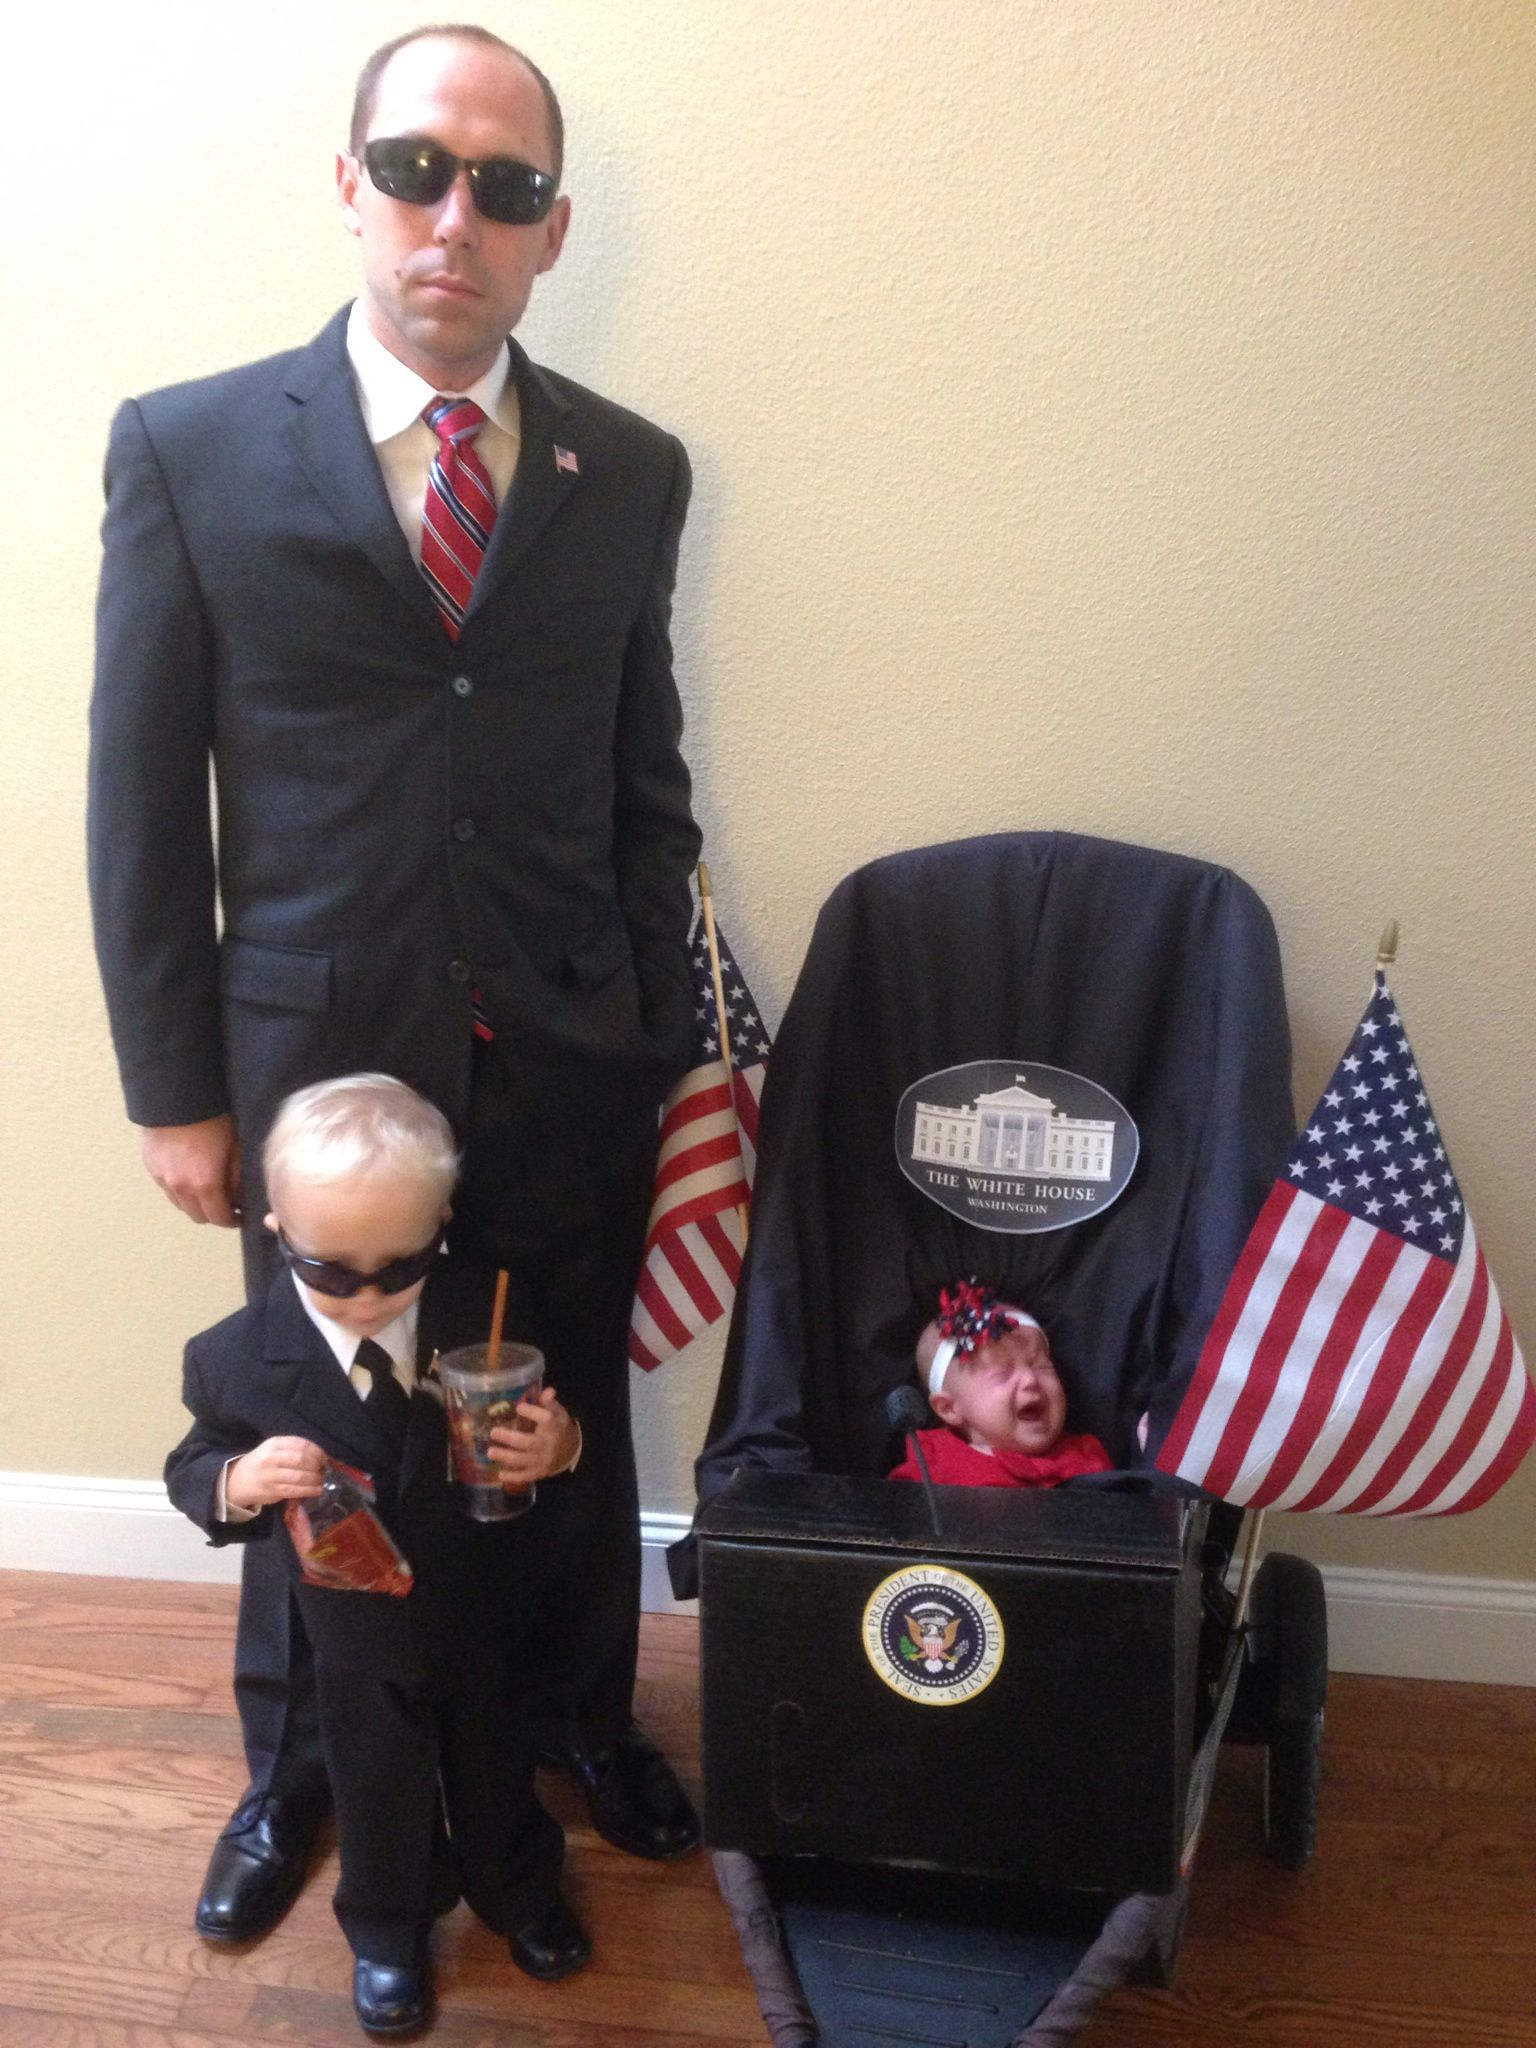 Group Family Halloween Costume President and Secret